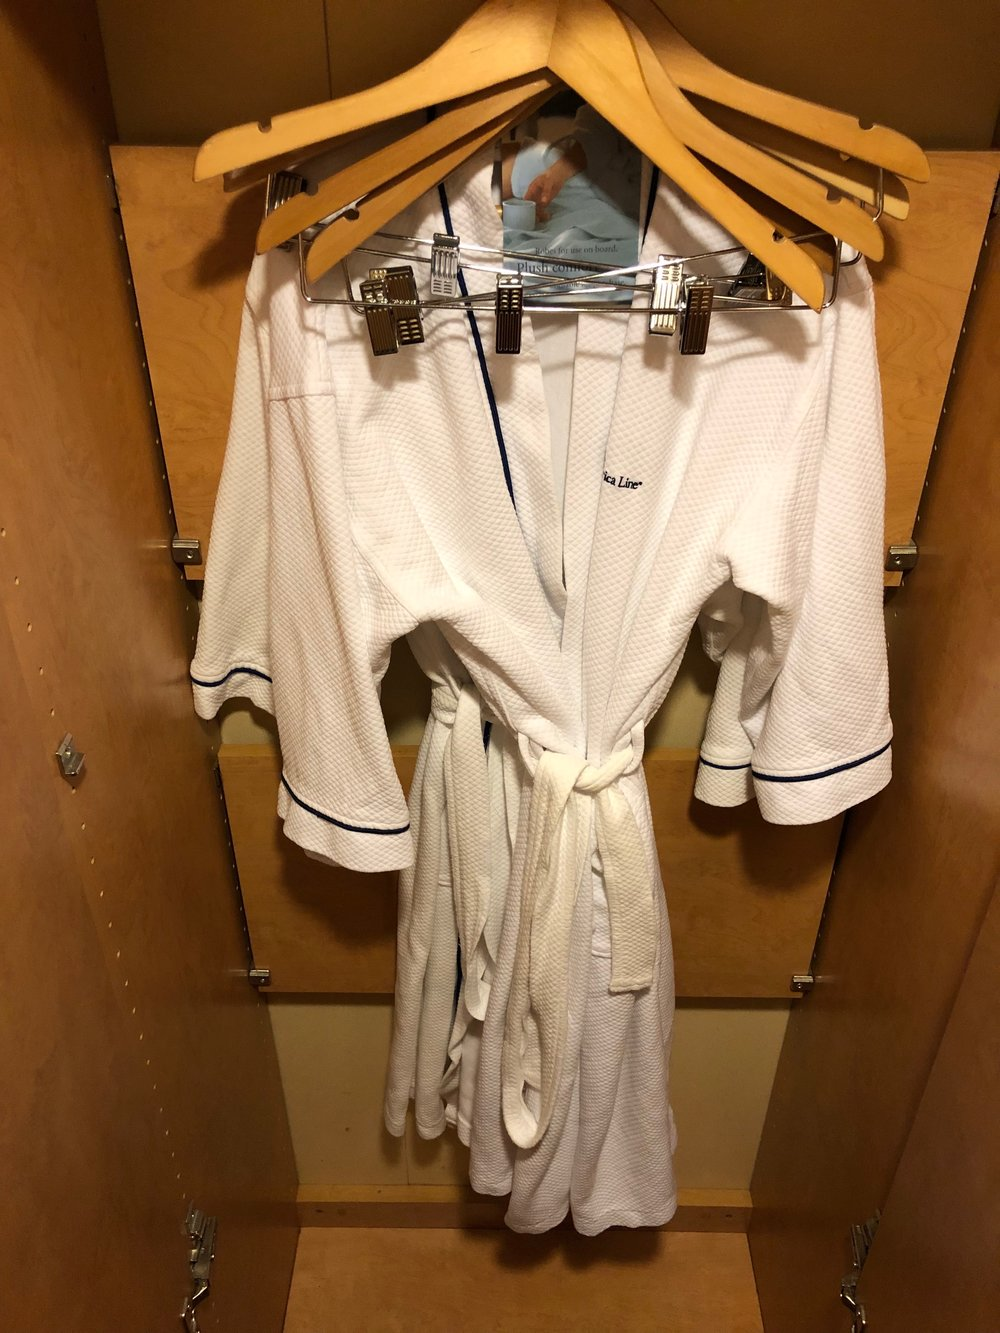 Closet & Robes